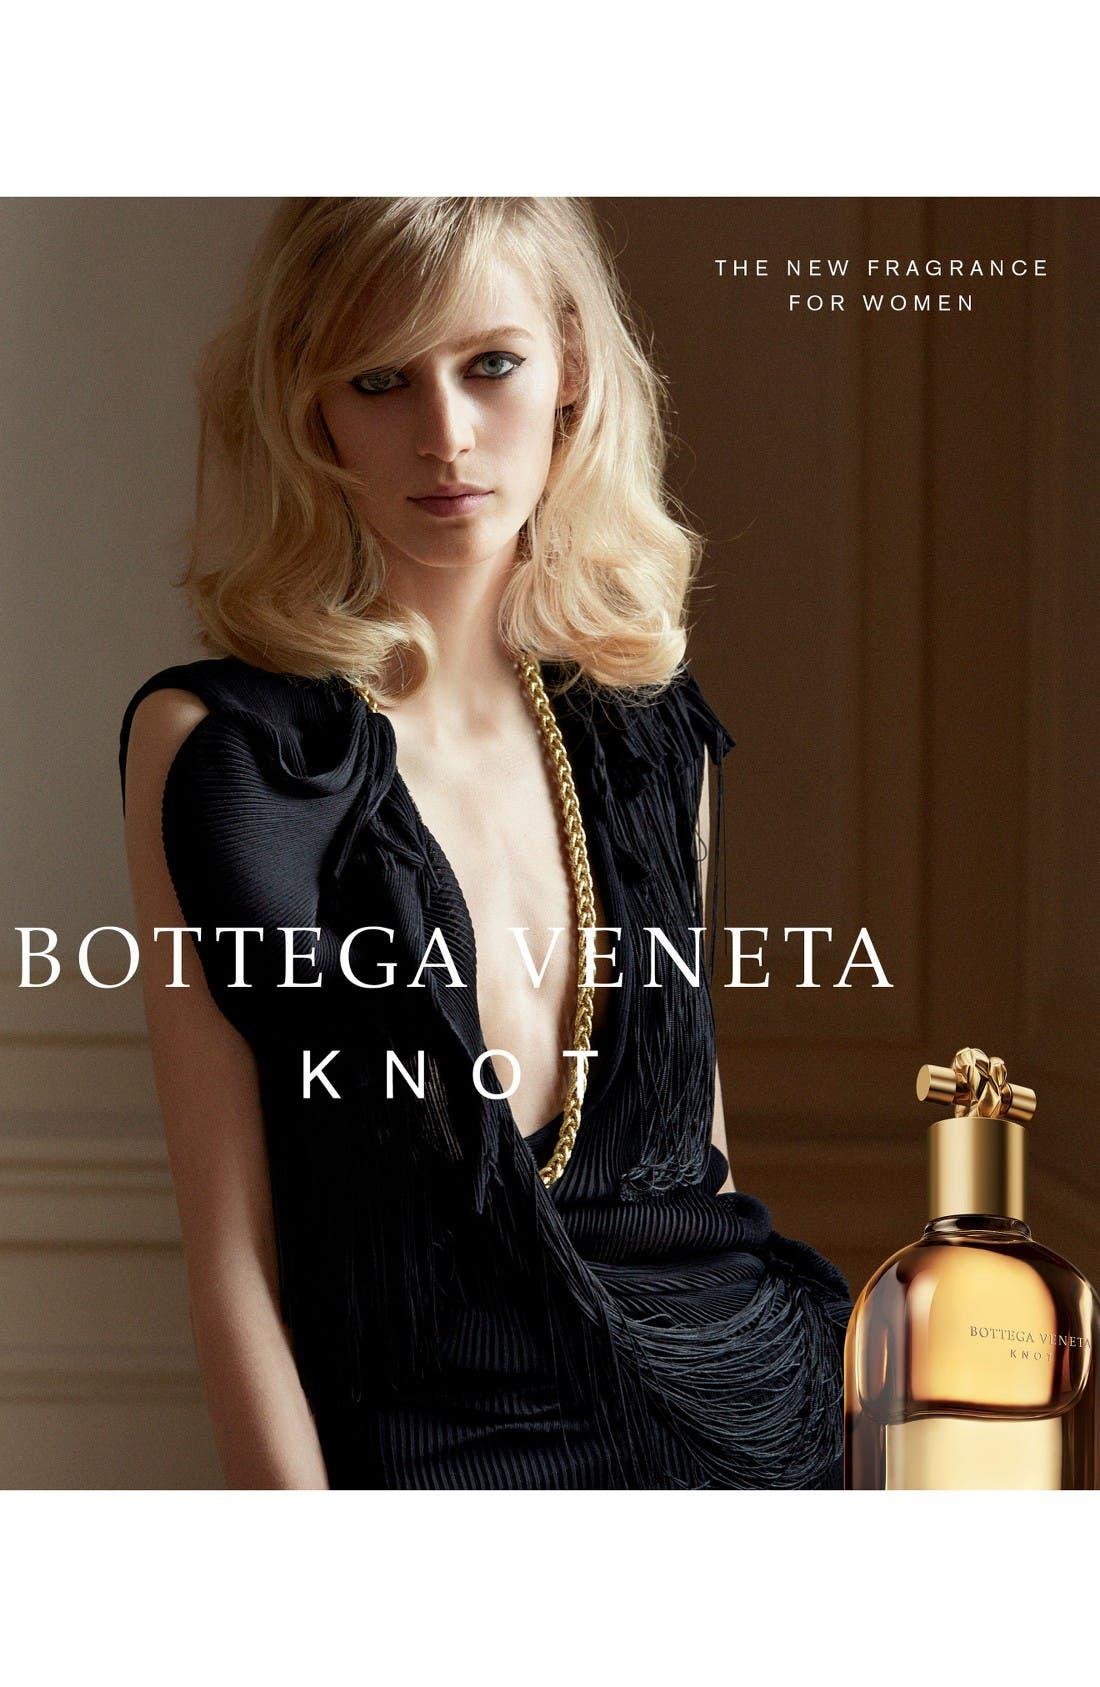 Alternate Image 2  - Bottega Veneta Knot Eau de Parfum Spray